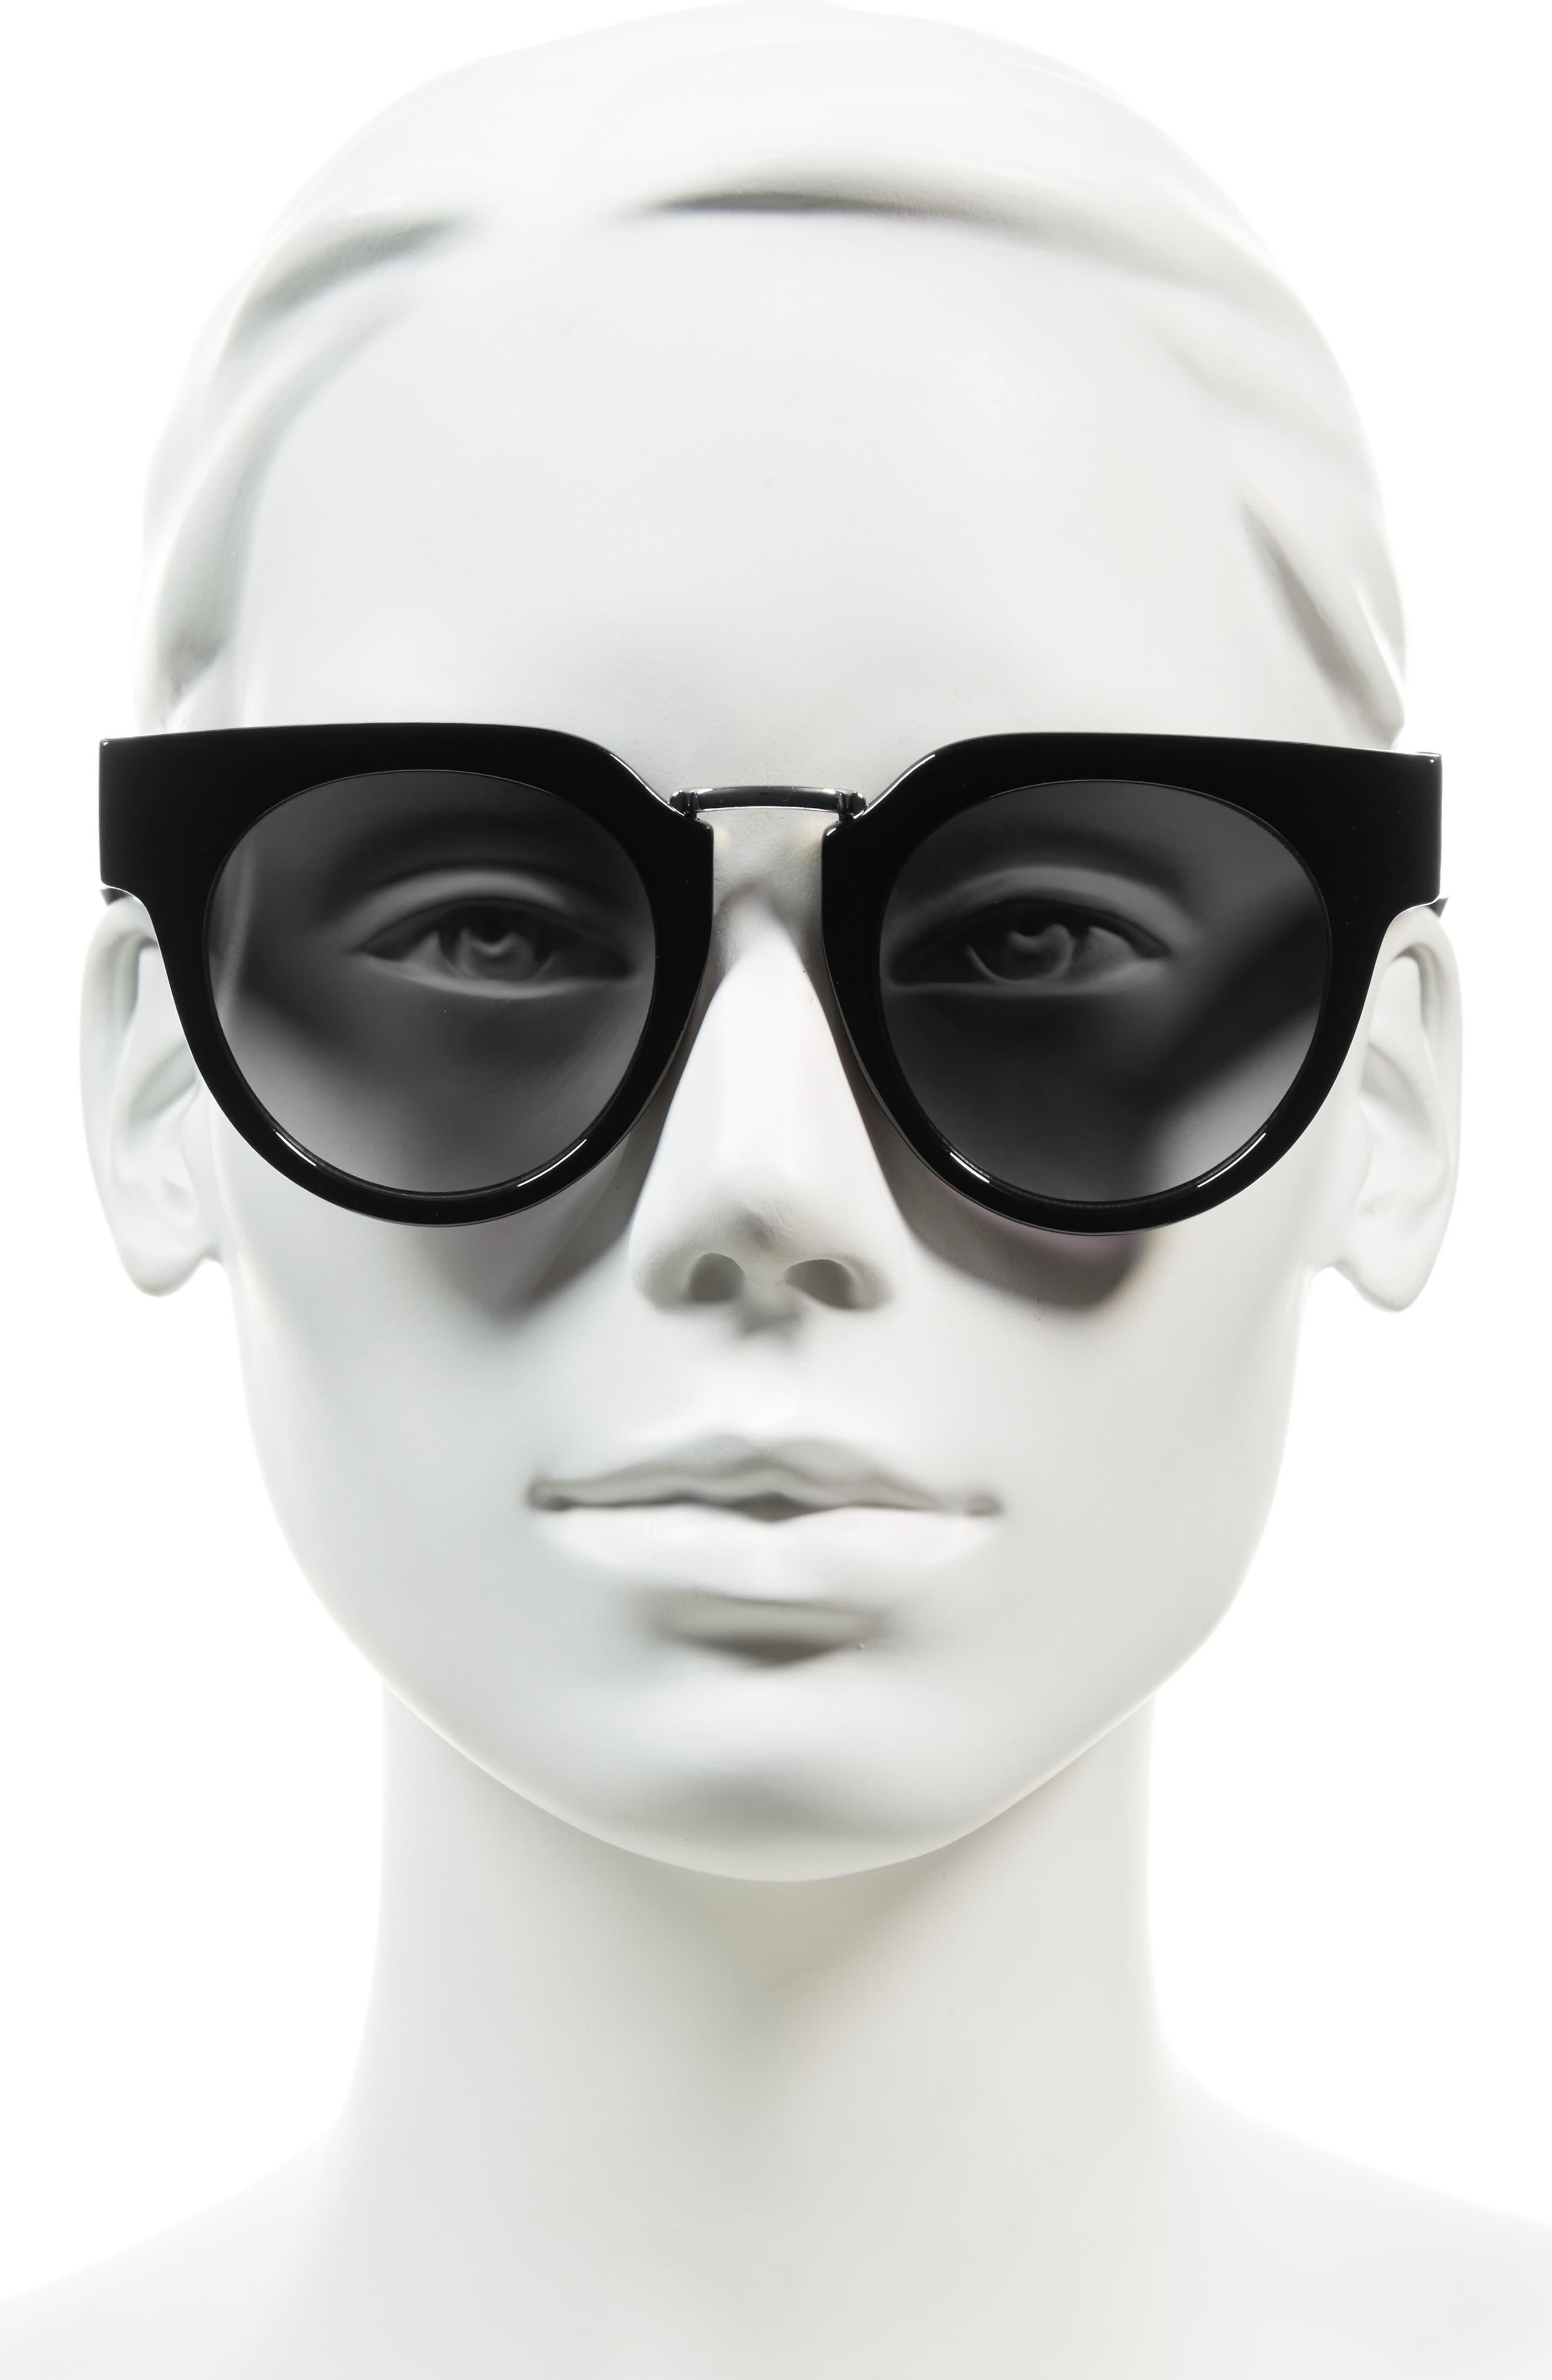 48mm Round Sunglasses,                             Alternate thumbnail 3, color,                             001